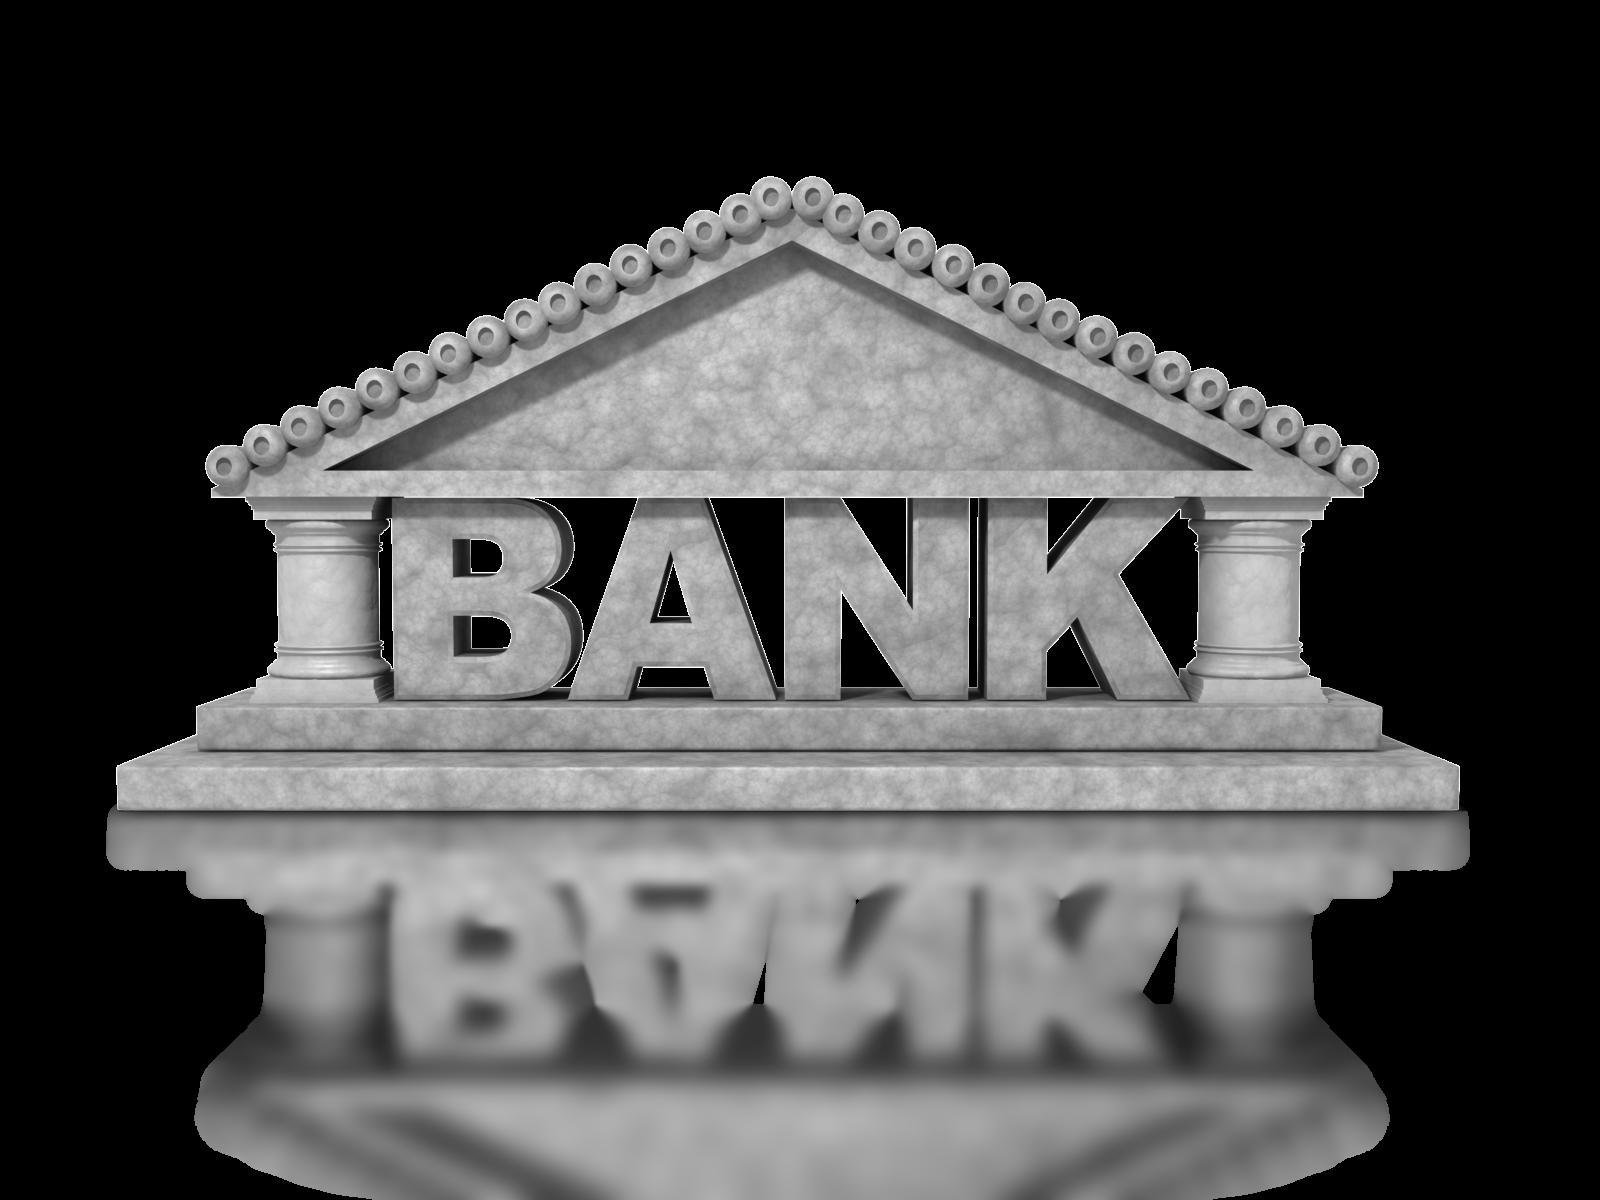 Bank PNG Images Transparent Free Download.